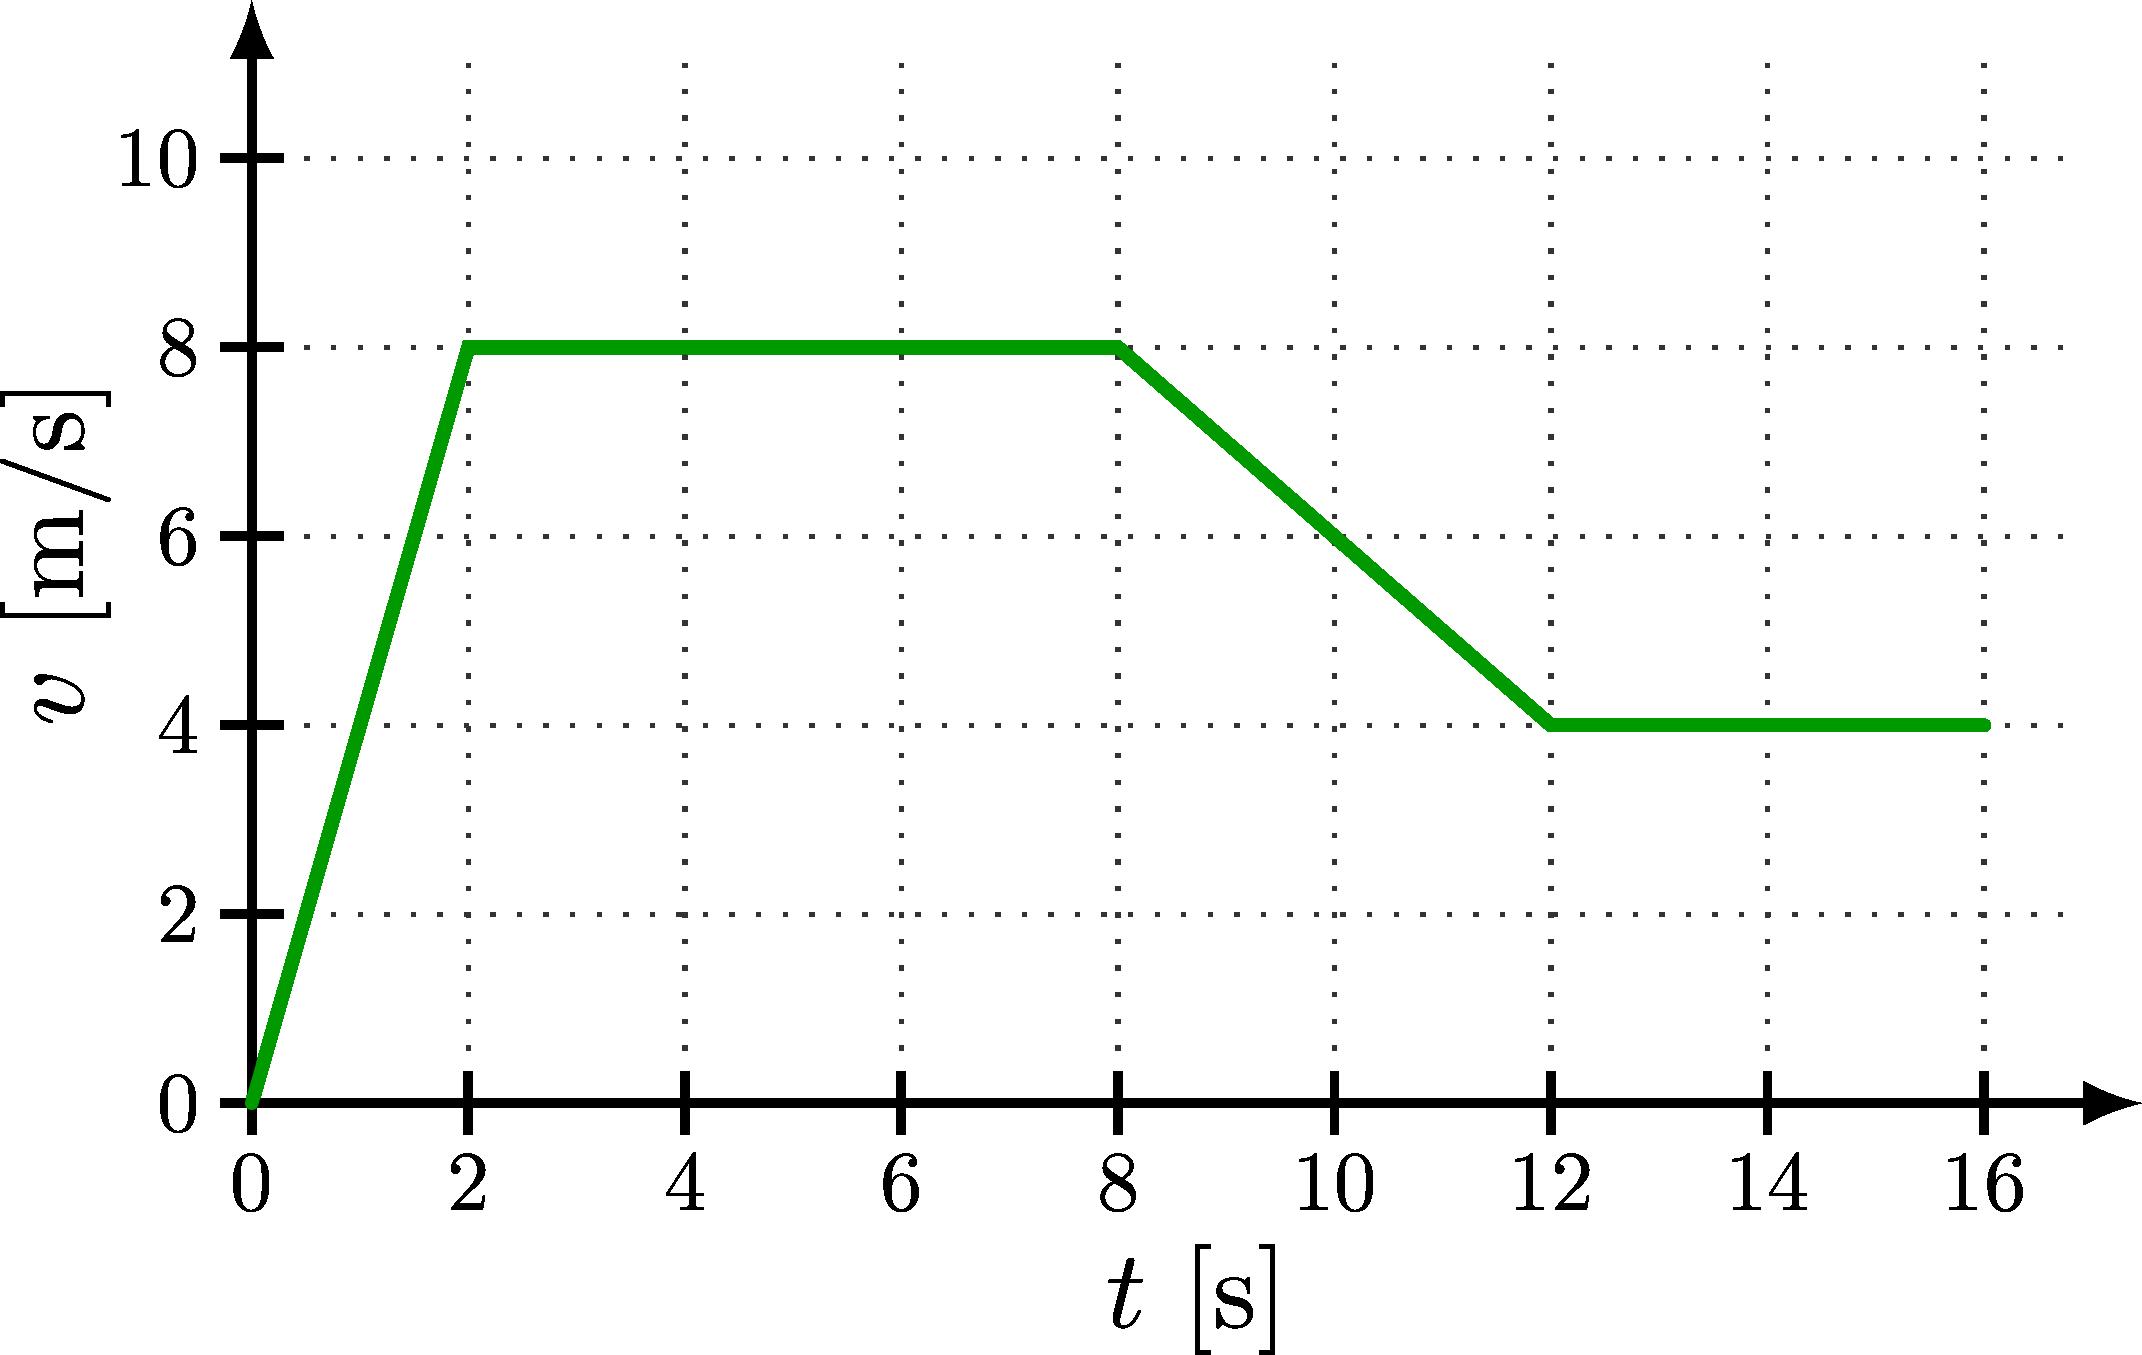 kinematics_graph-001.png